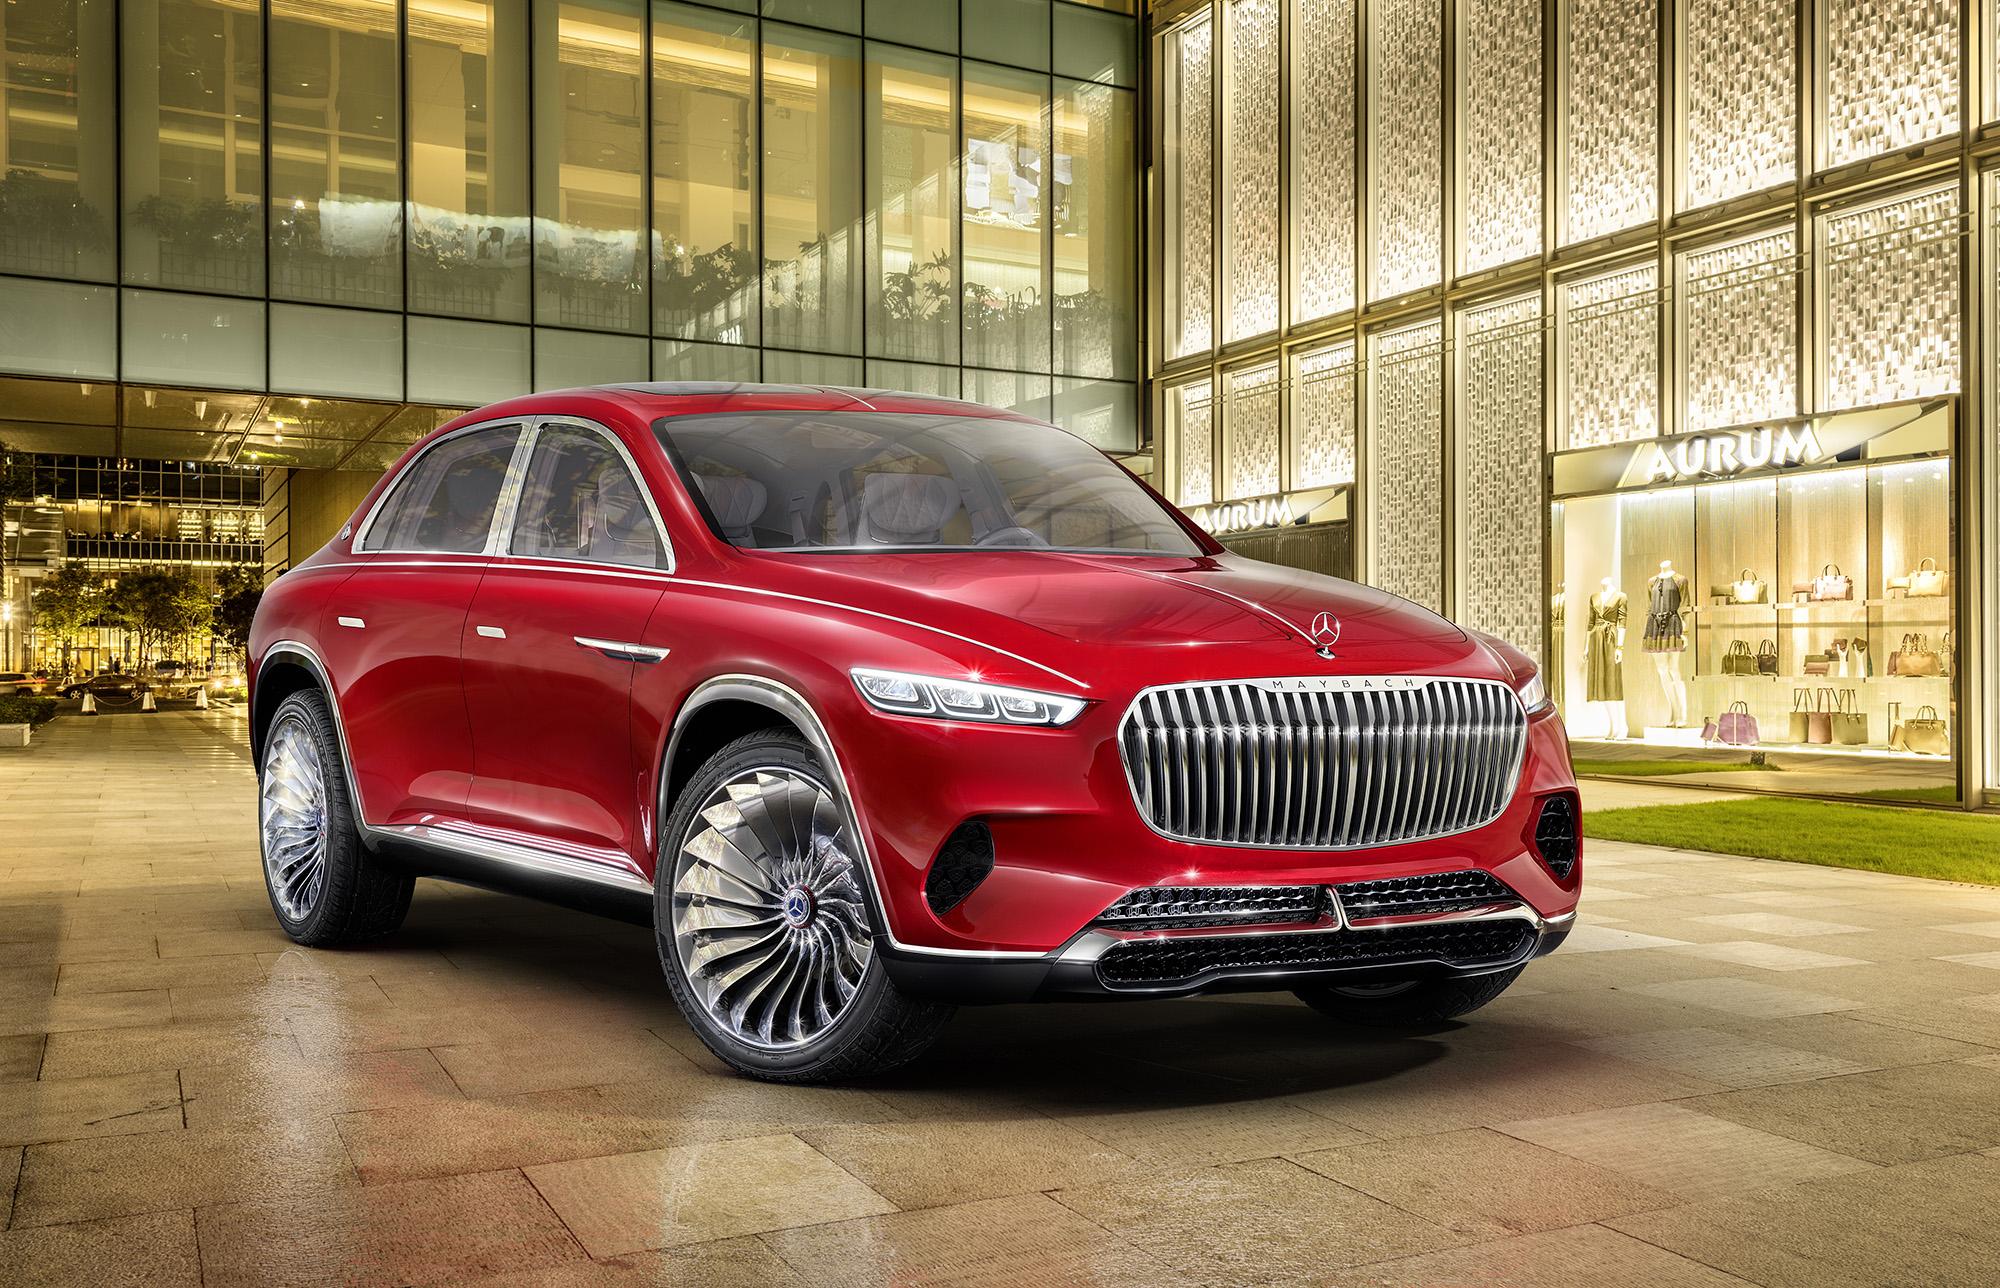 Luxury Car Vision >> Mercedes Ultimate Luxury Suv Includes Actual Tea Set Gearjunkie